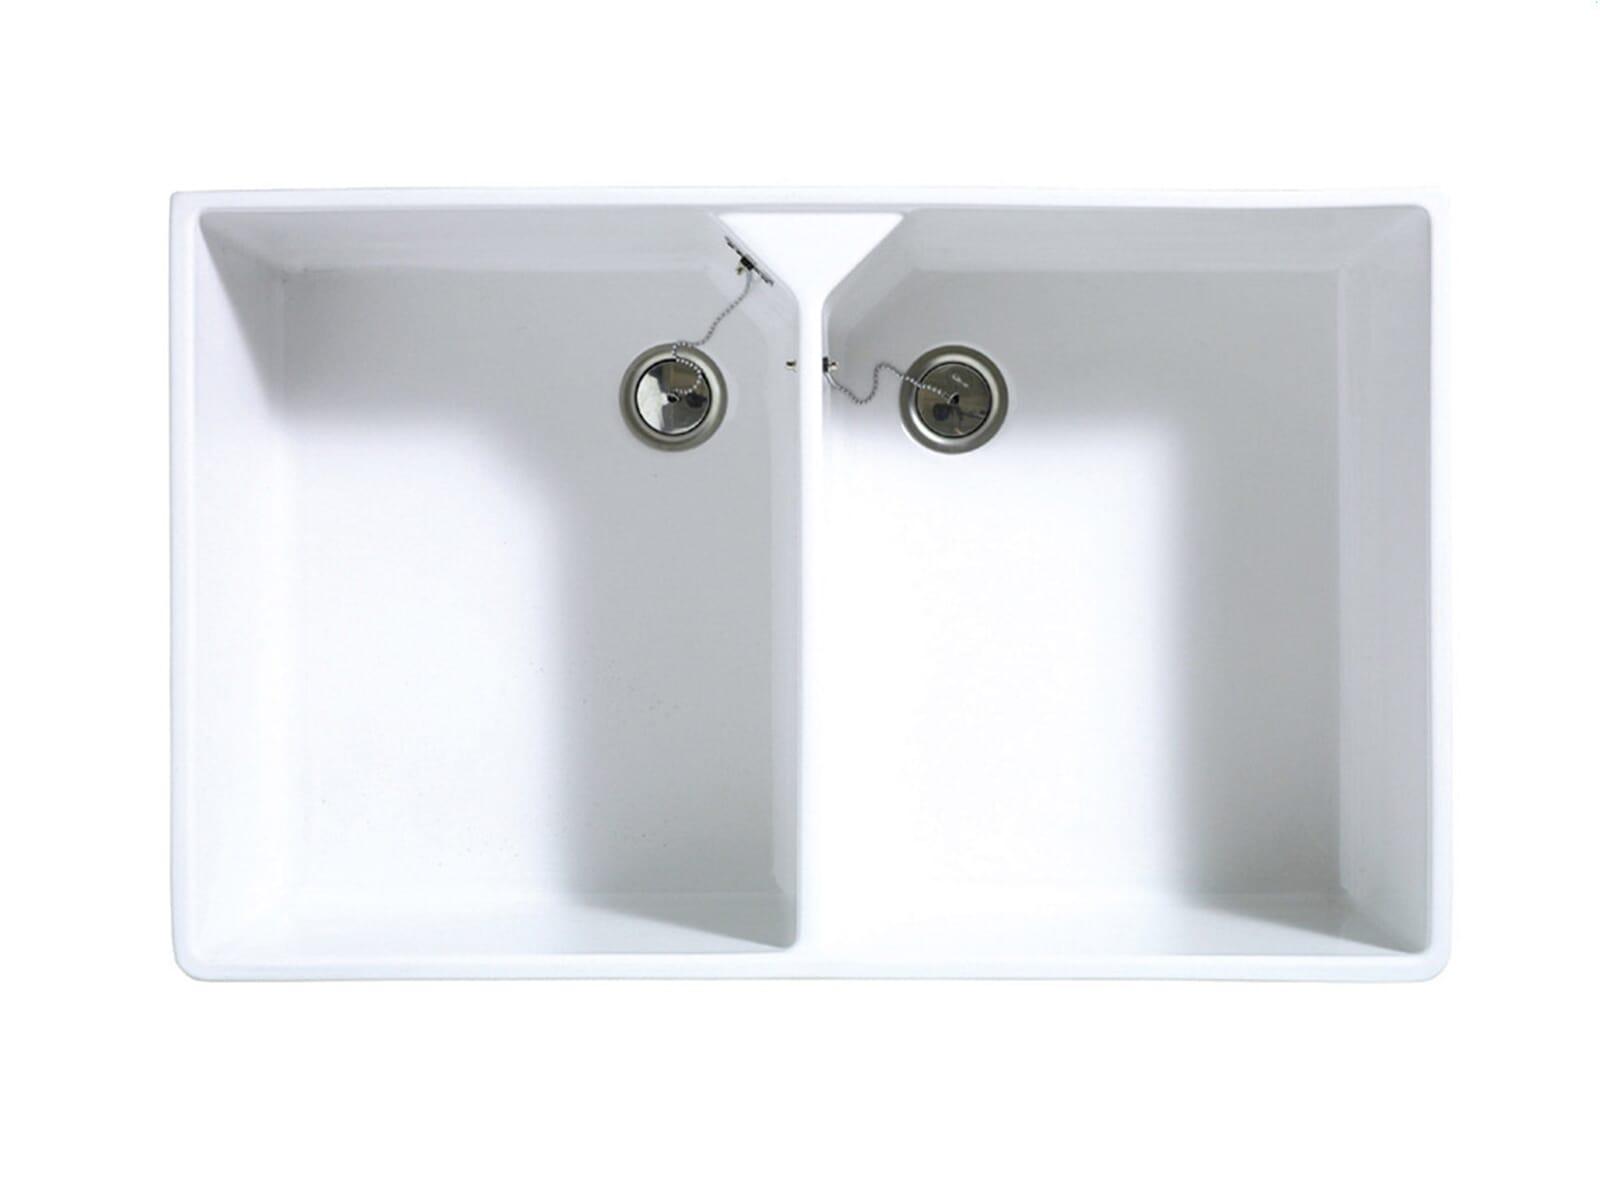 Astracast Sudbury 2.0 Weiß Hochglanz Keramik-Spüle